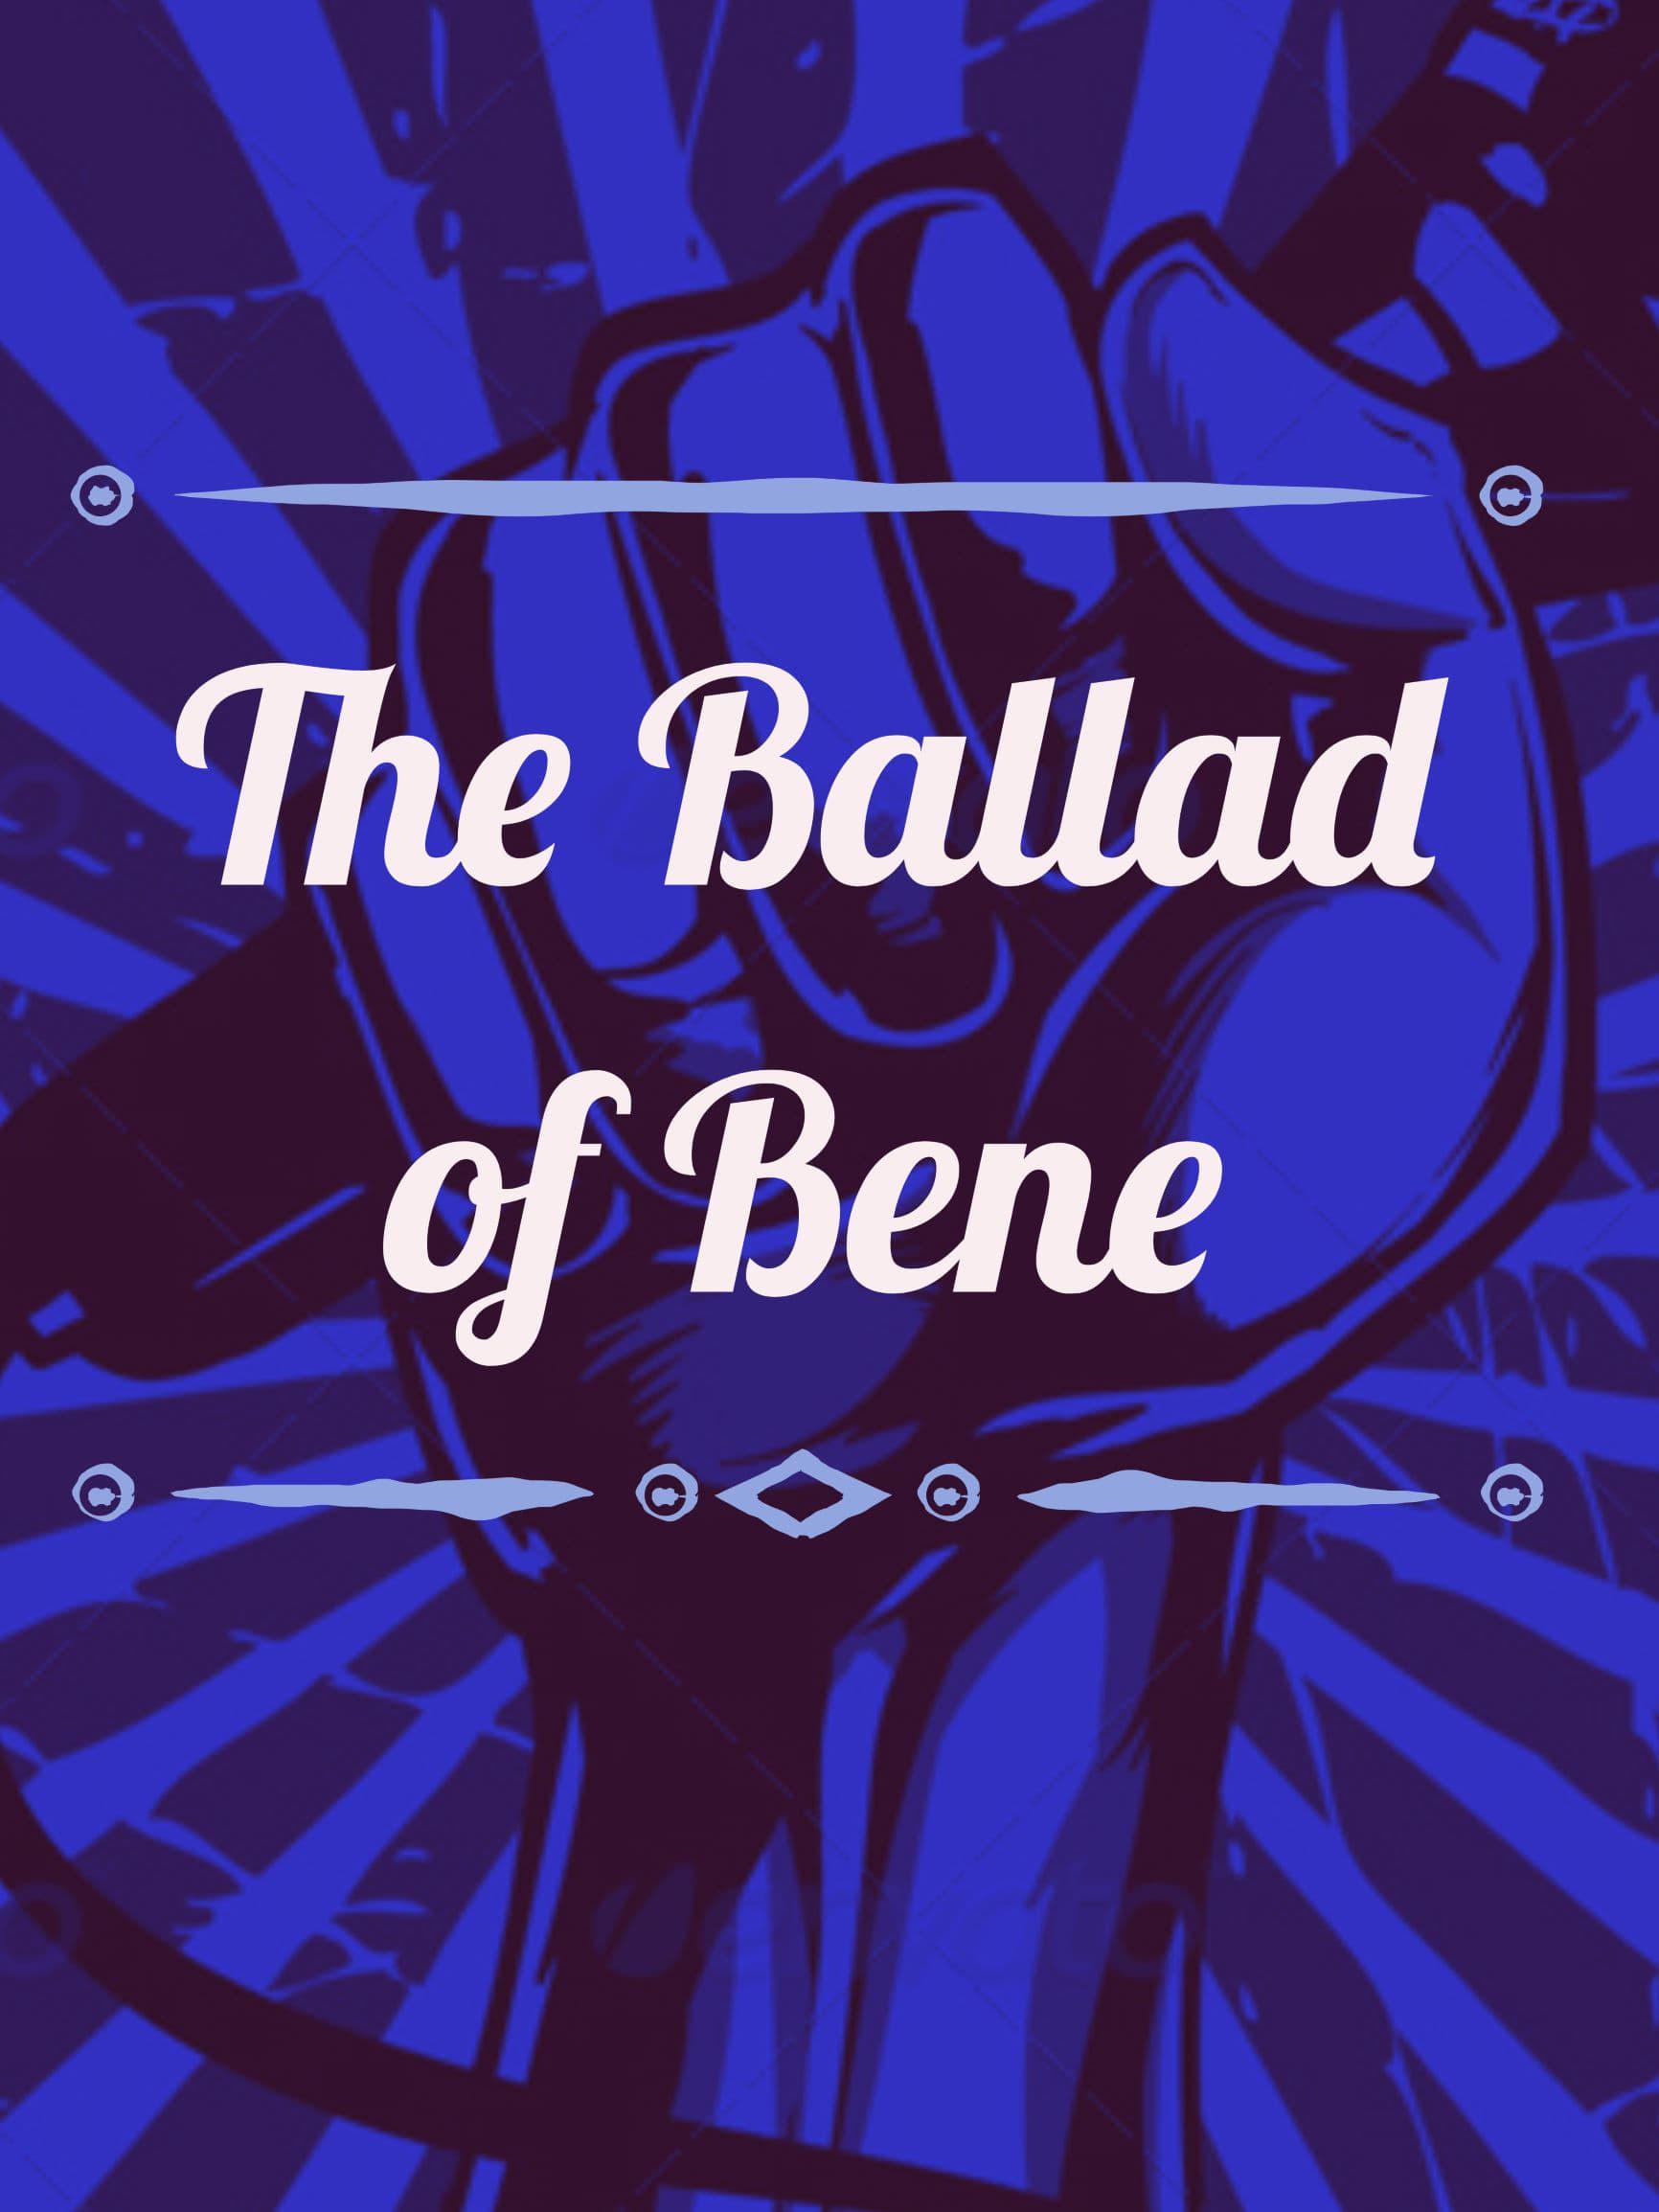 The Ballad of Bene (2018)